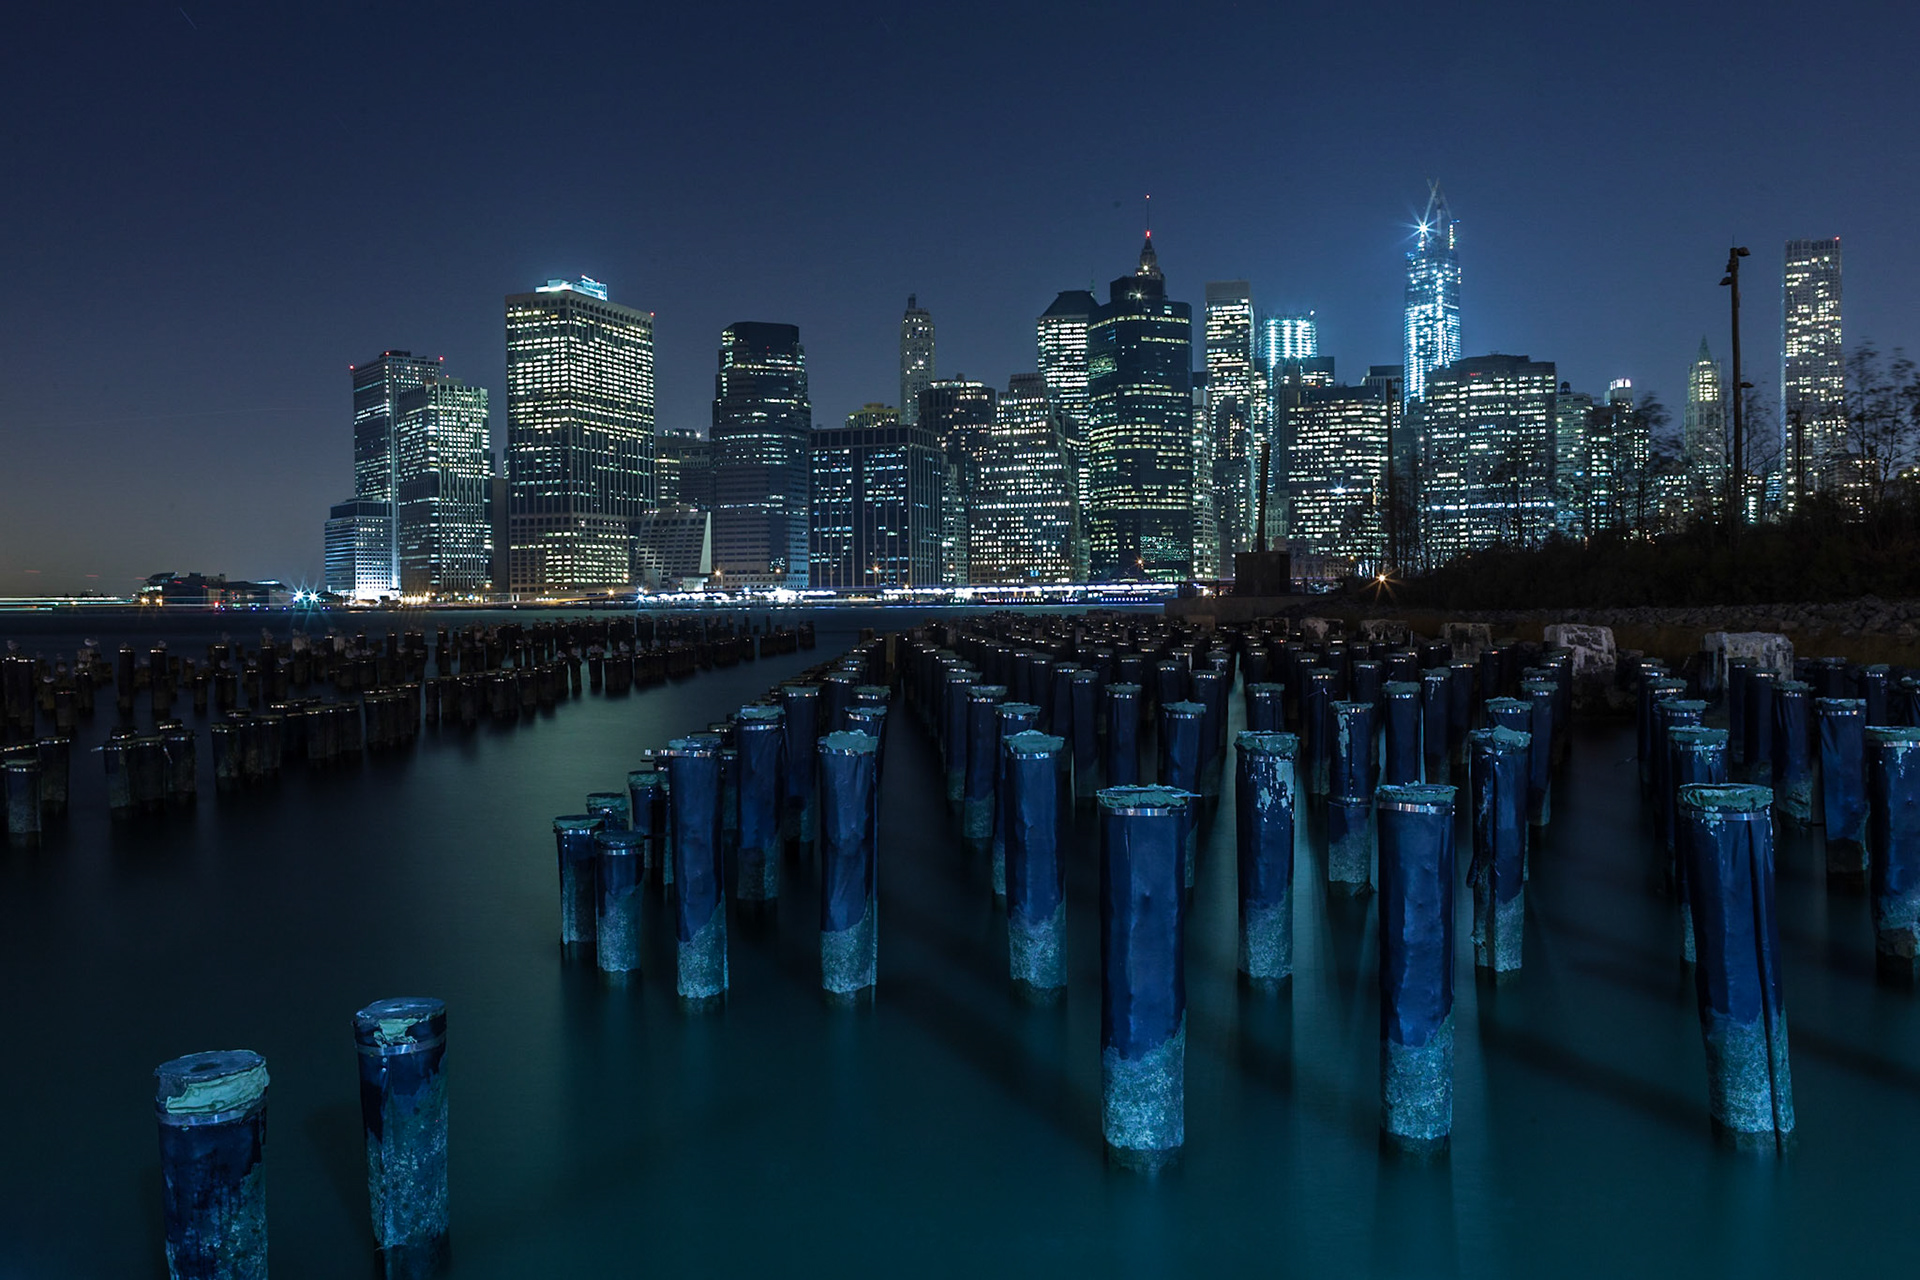 heidger marx photography - New York City at night